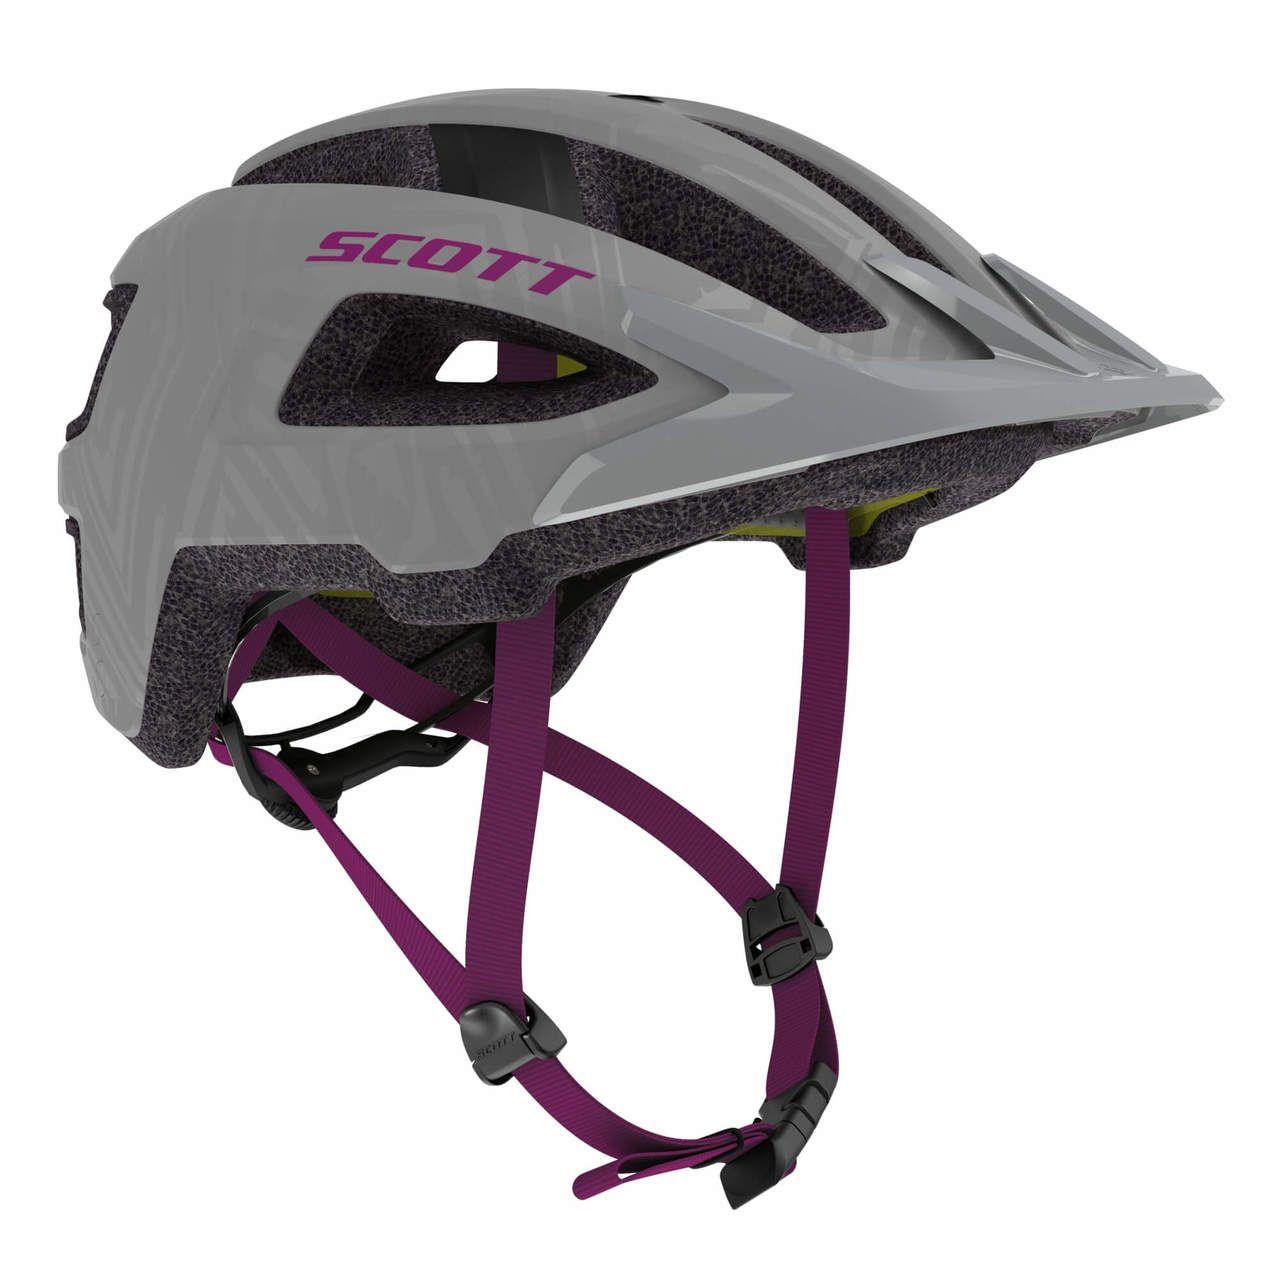 Scott Groove Plus Cpsc Helmet 2020 With Images Helmet